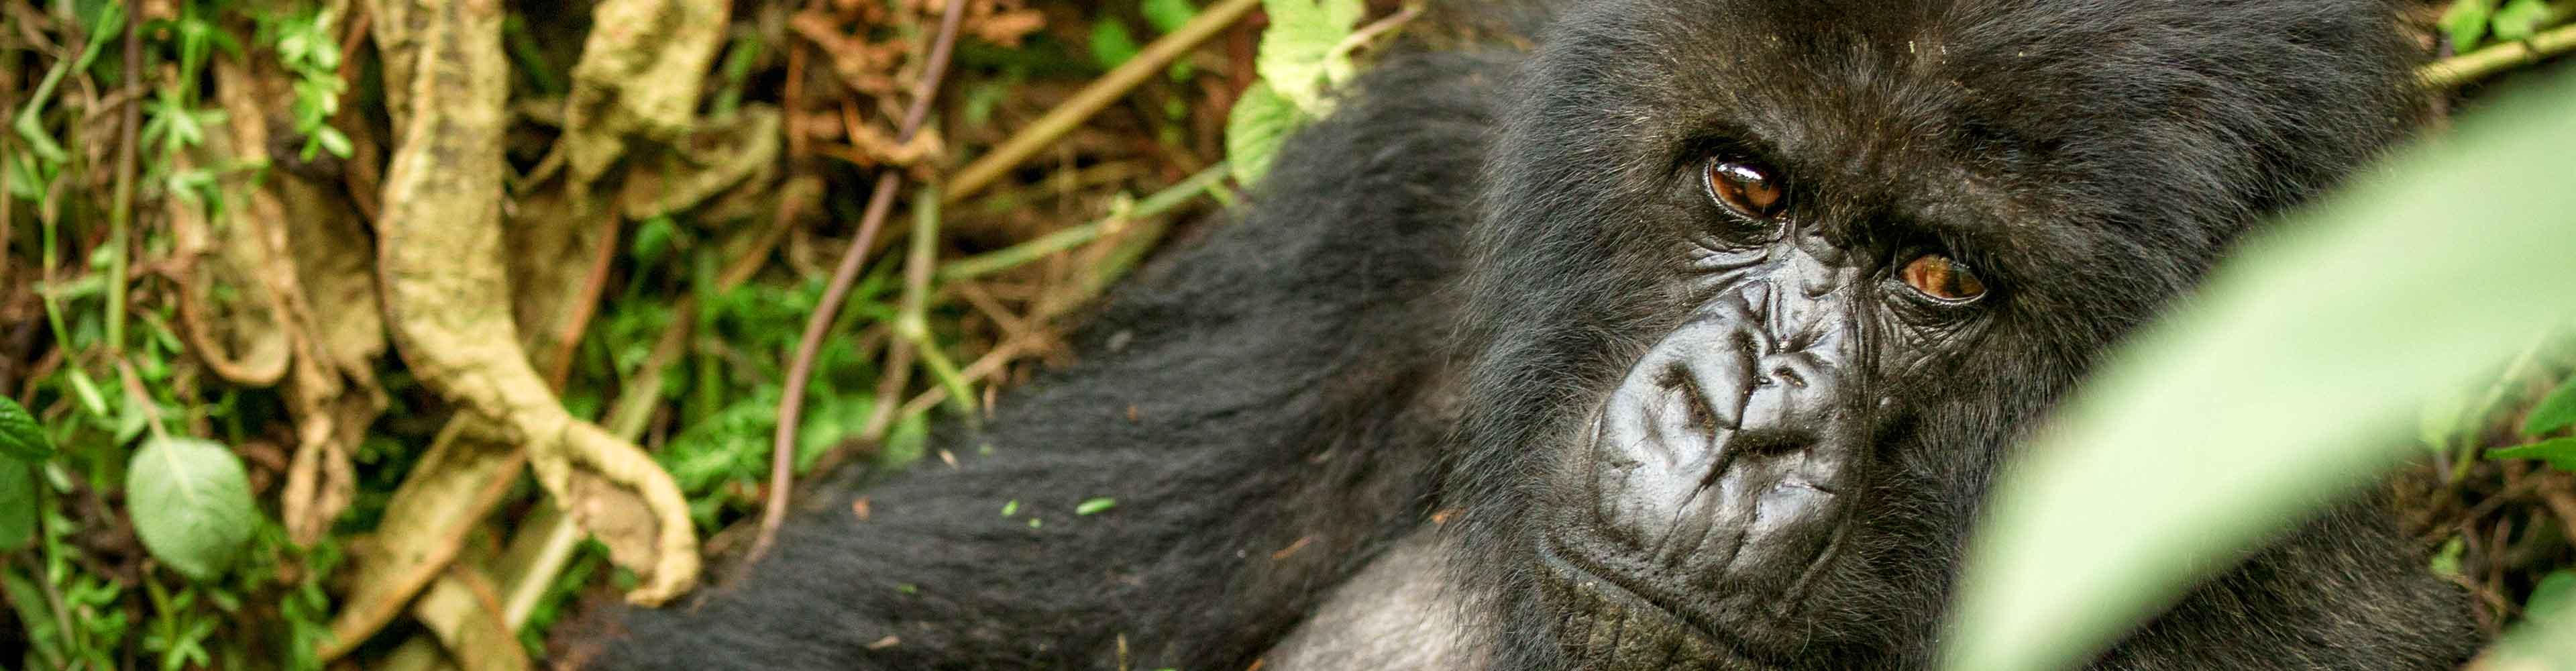 Mountain Gorillas of Rwanda Experience – Independent